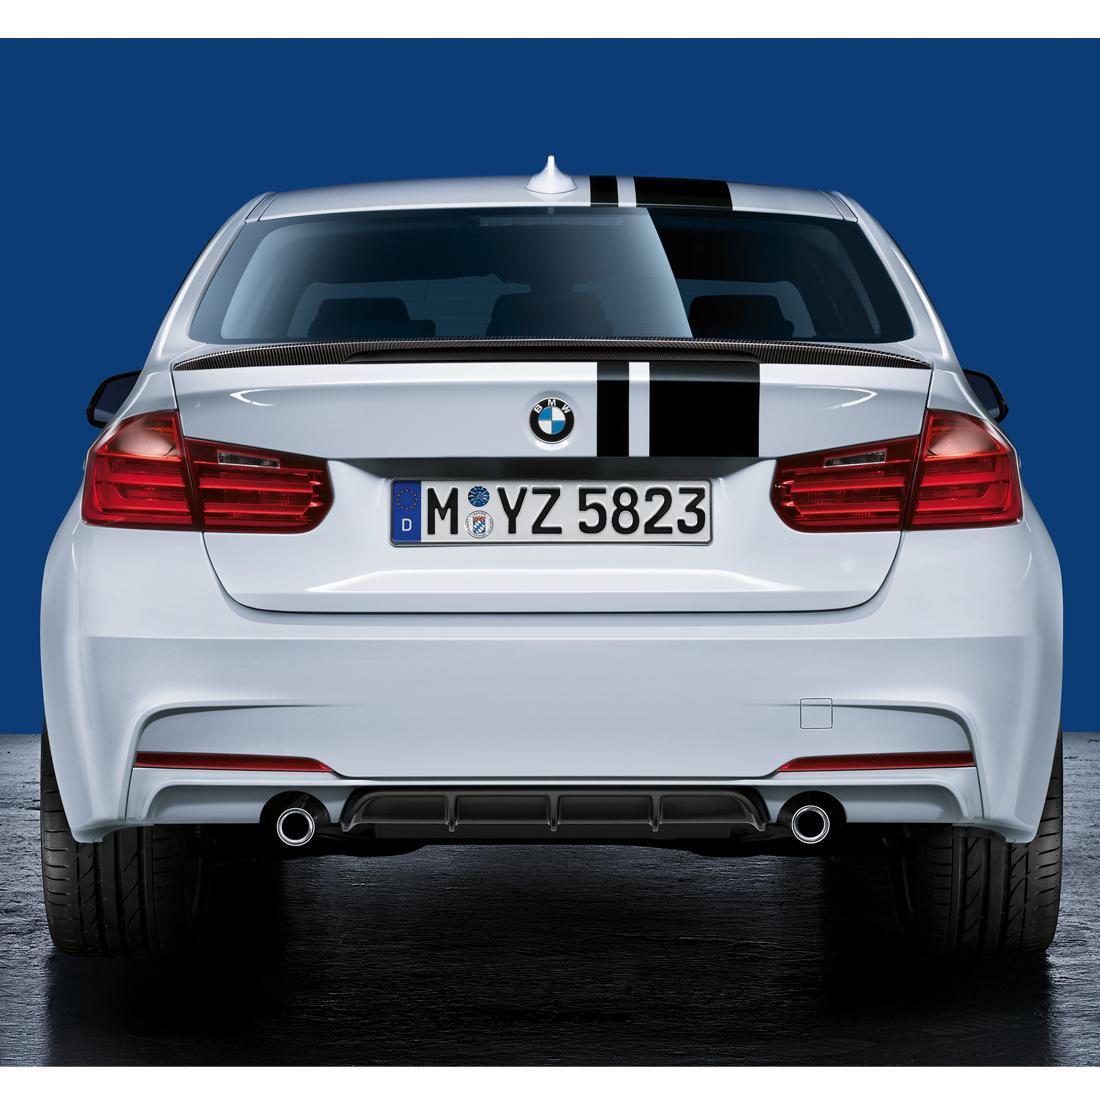 Bmw Years: ShopBMWUSA.com: BMW M PERFORMANCE REAR DIFFUSER